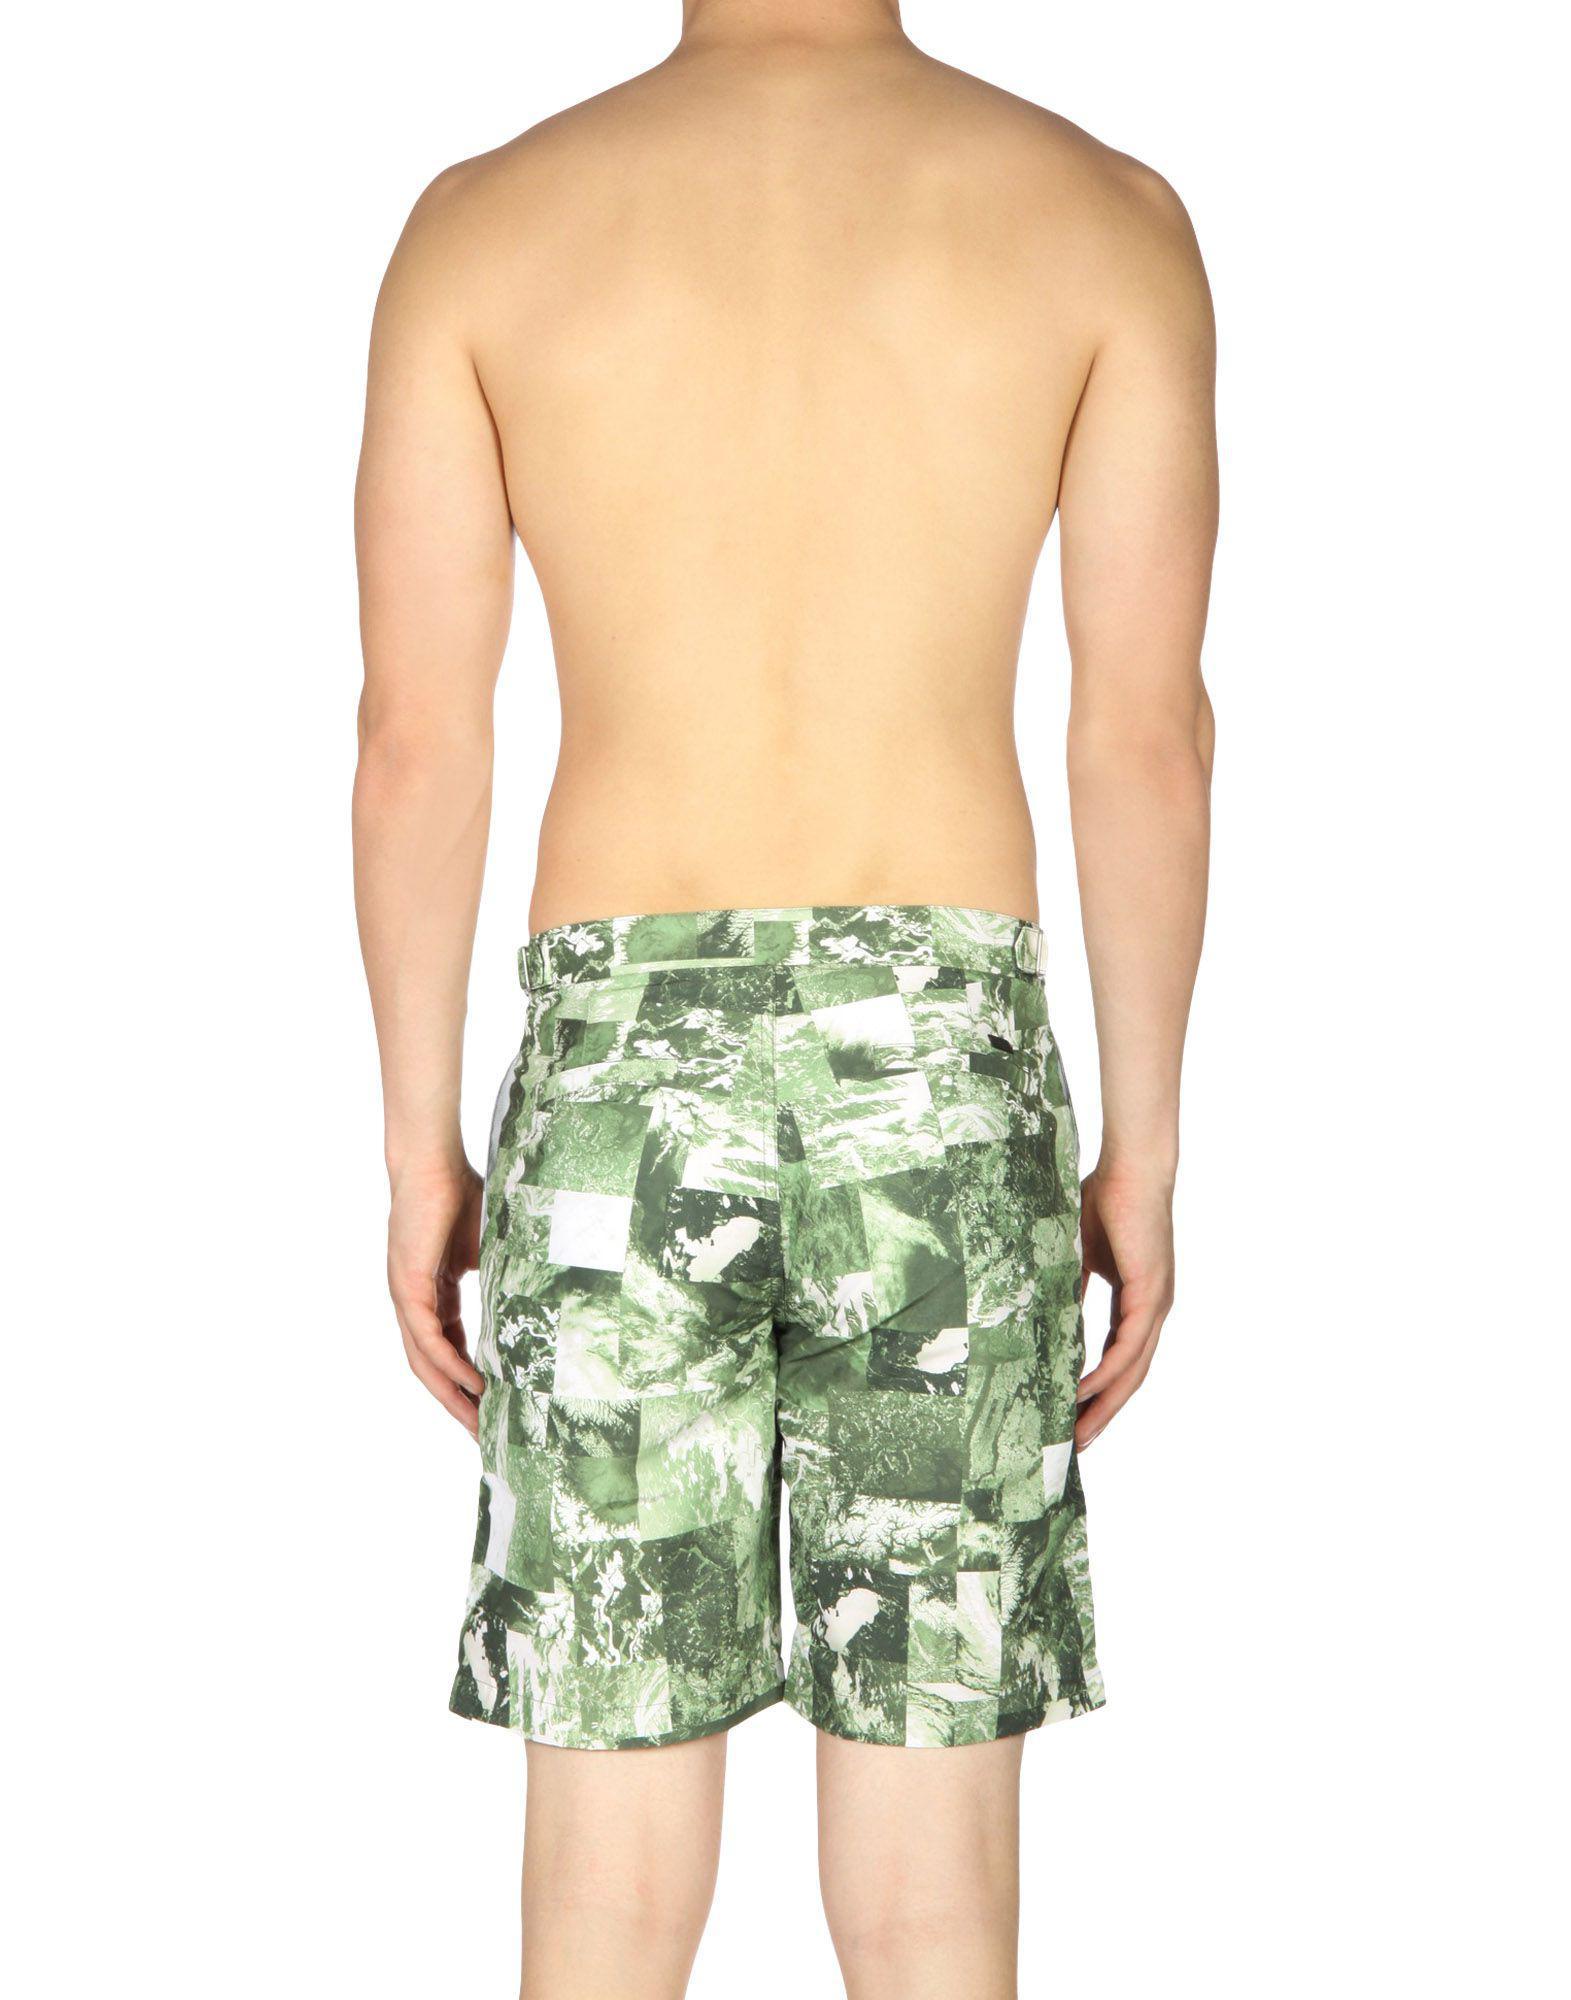 56399e455f Lyst - Armani Exchange Swim Trunks in Green for Men